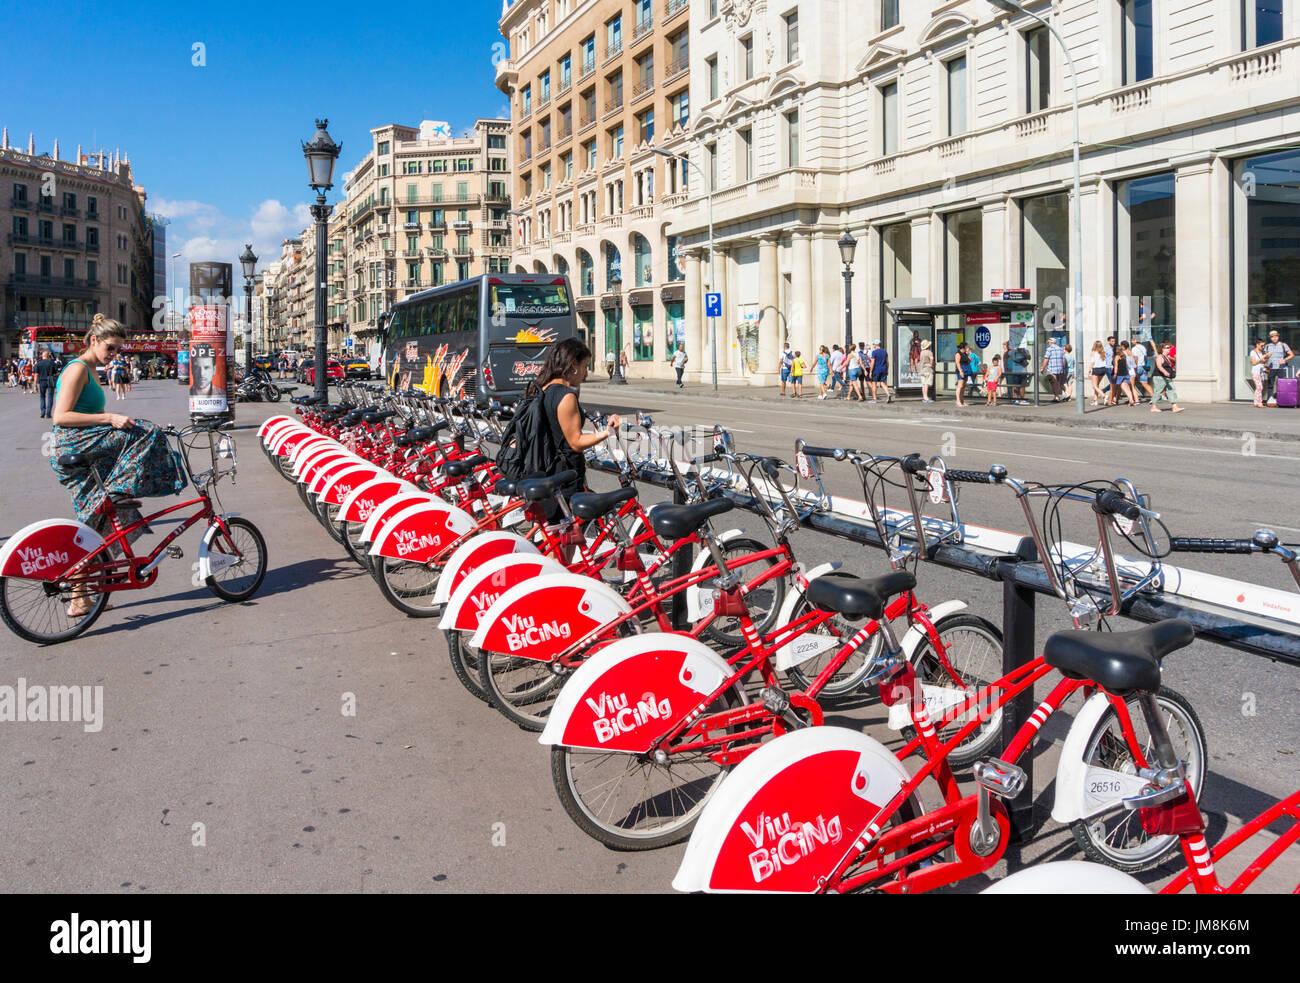 Barcelona Spain Catalunya barcelona Plaça de Catalunya Santander bikes cycle hire woman on bike central square of Barcelona spain eu europe Catalonia - Stock Image